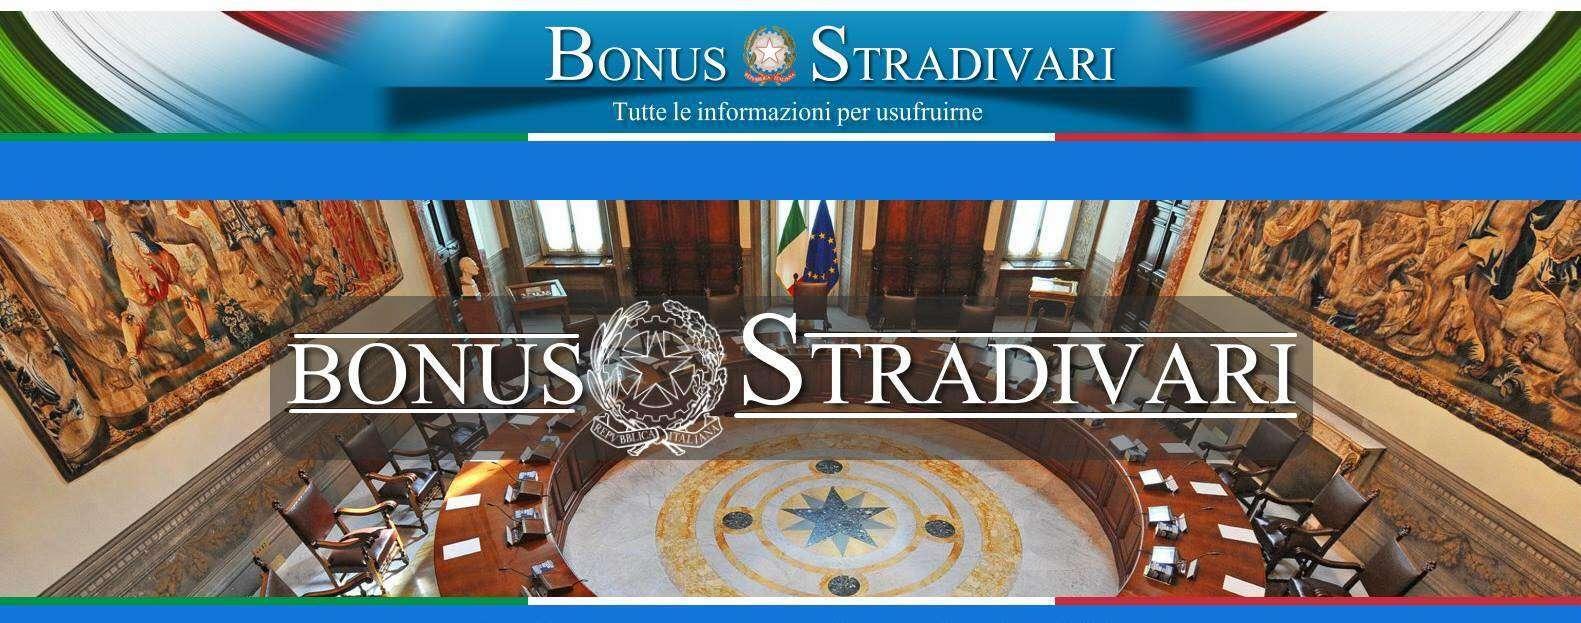 Bonus-Progetto-Stradivari-2018